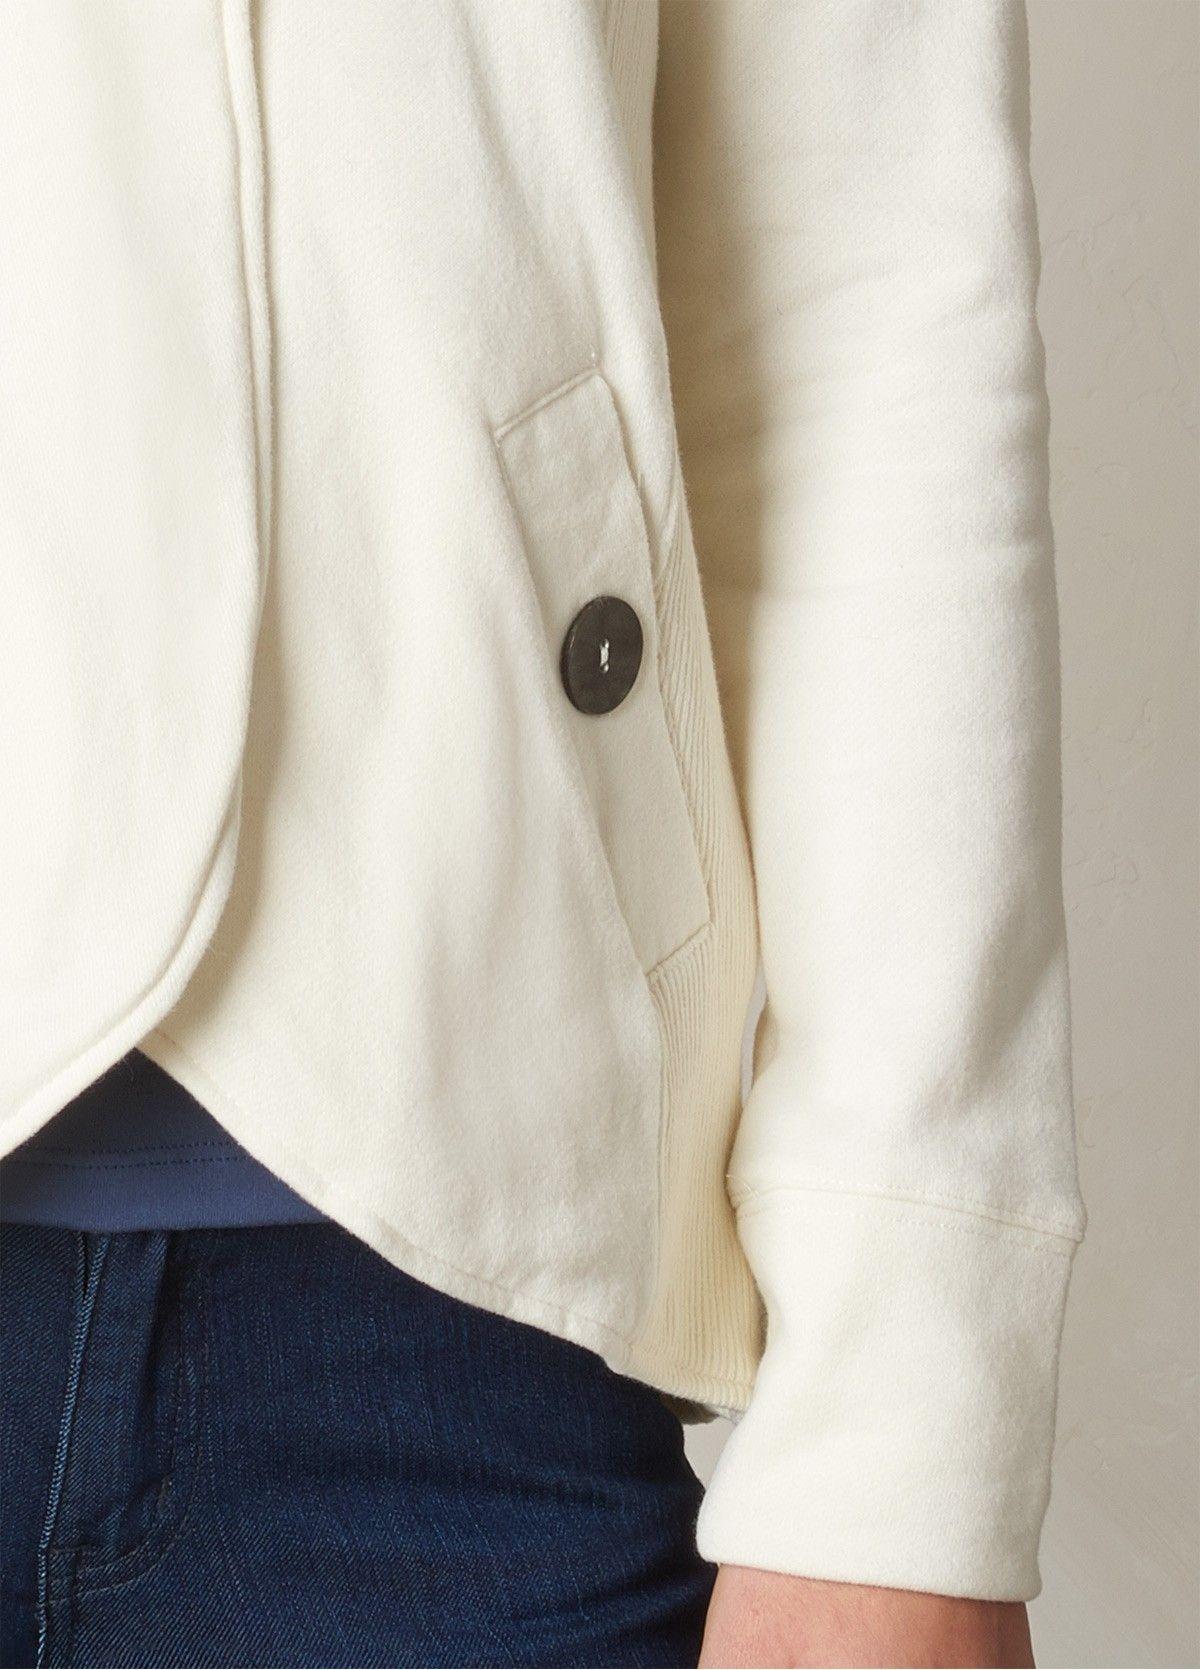 Darby Jacket | Women's Stylish Jackets & Outerwear | prAna